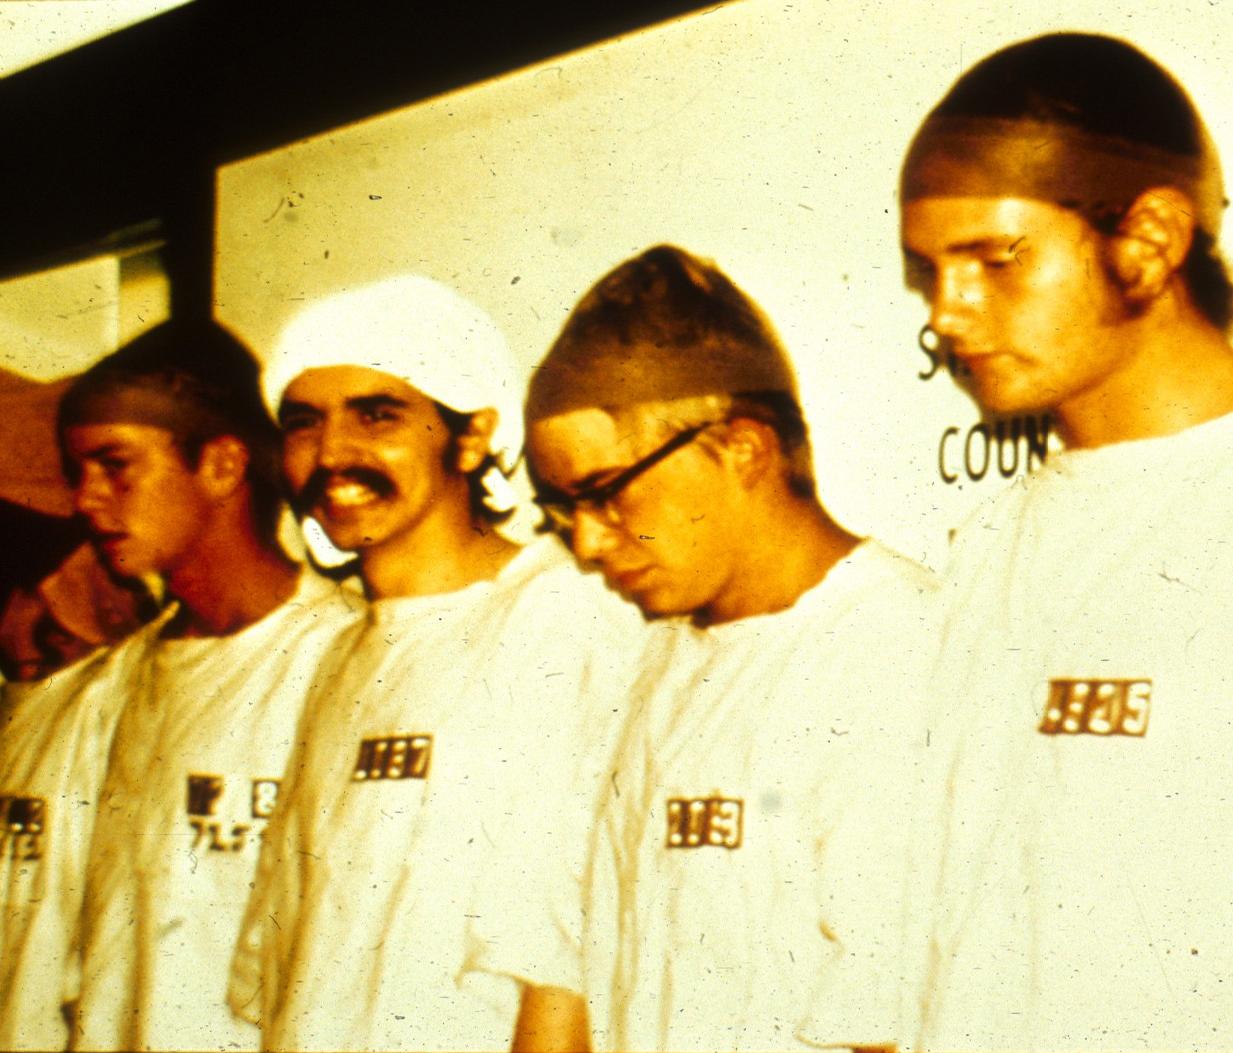 stanford prison experiment slideshow